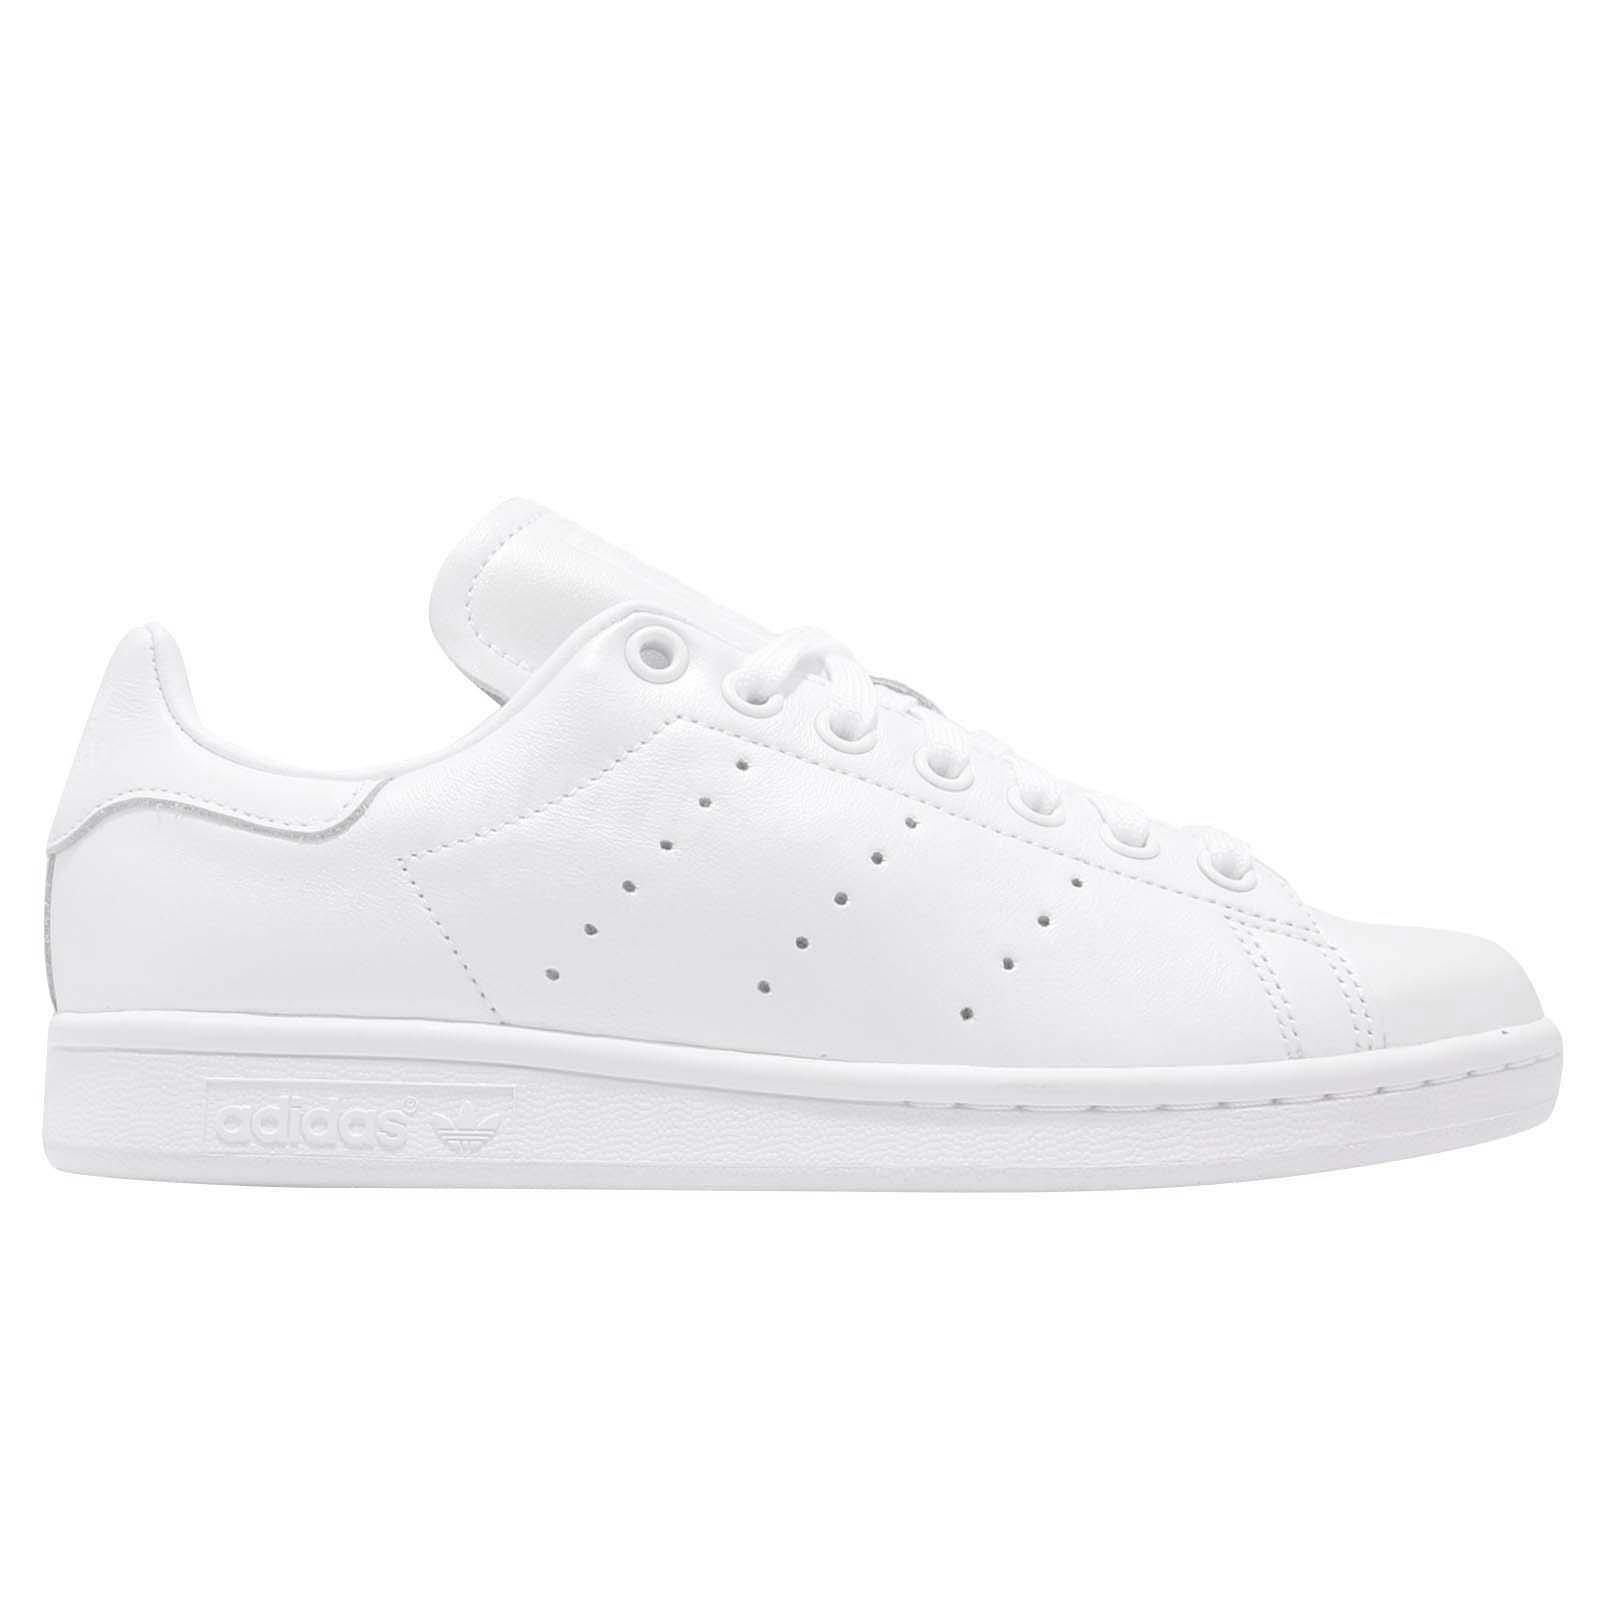 844632e5f51 adidas Originals Stan Smith W Triple White Women Casual Shoes ...